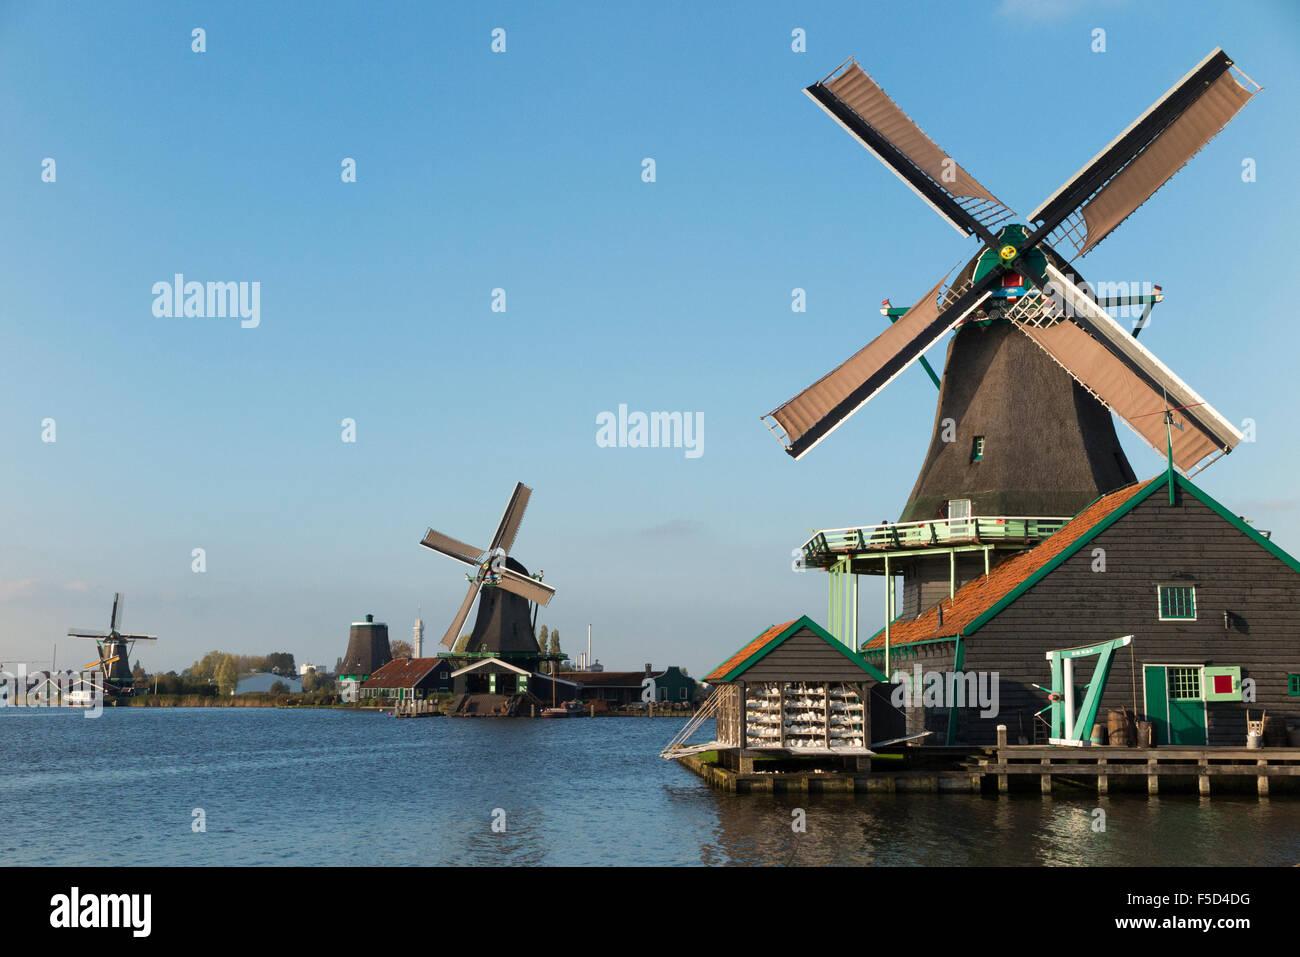 De Kat Farbe holländische Windmühle (nahe an der Kamera) / Windmühlen / Windmühlen / Wind mühlen, Stockbild